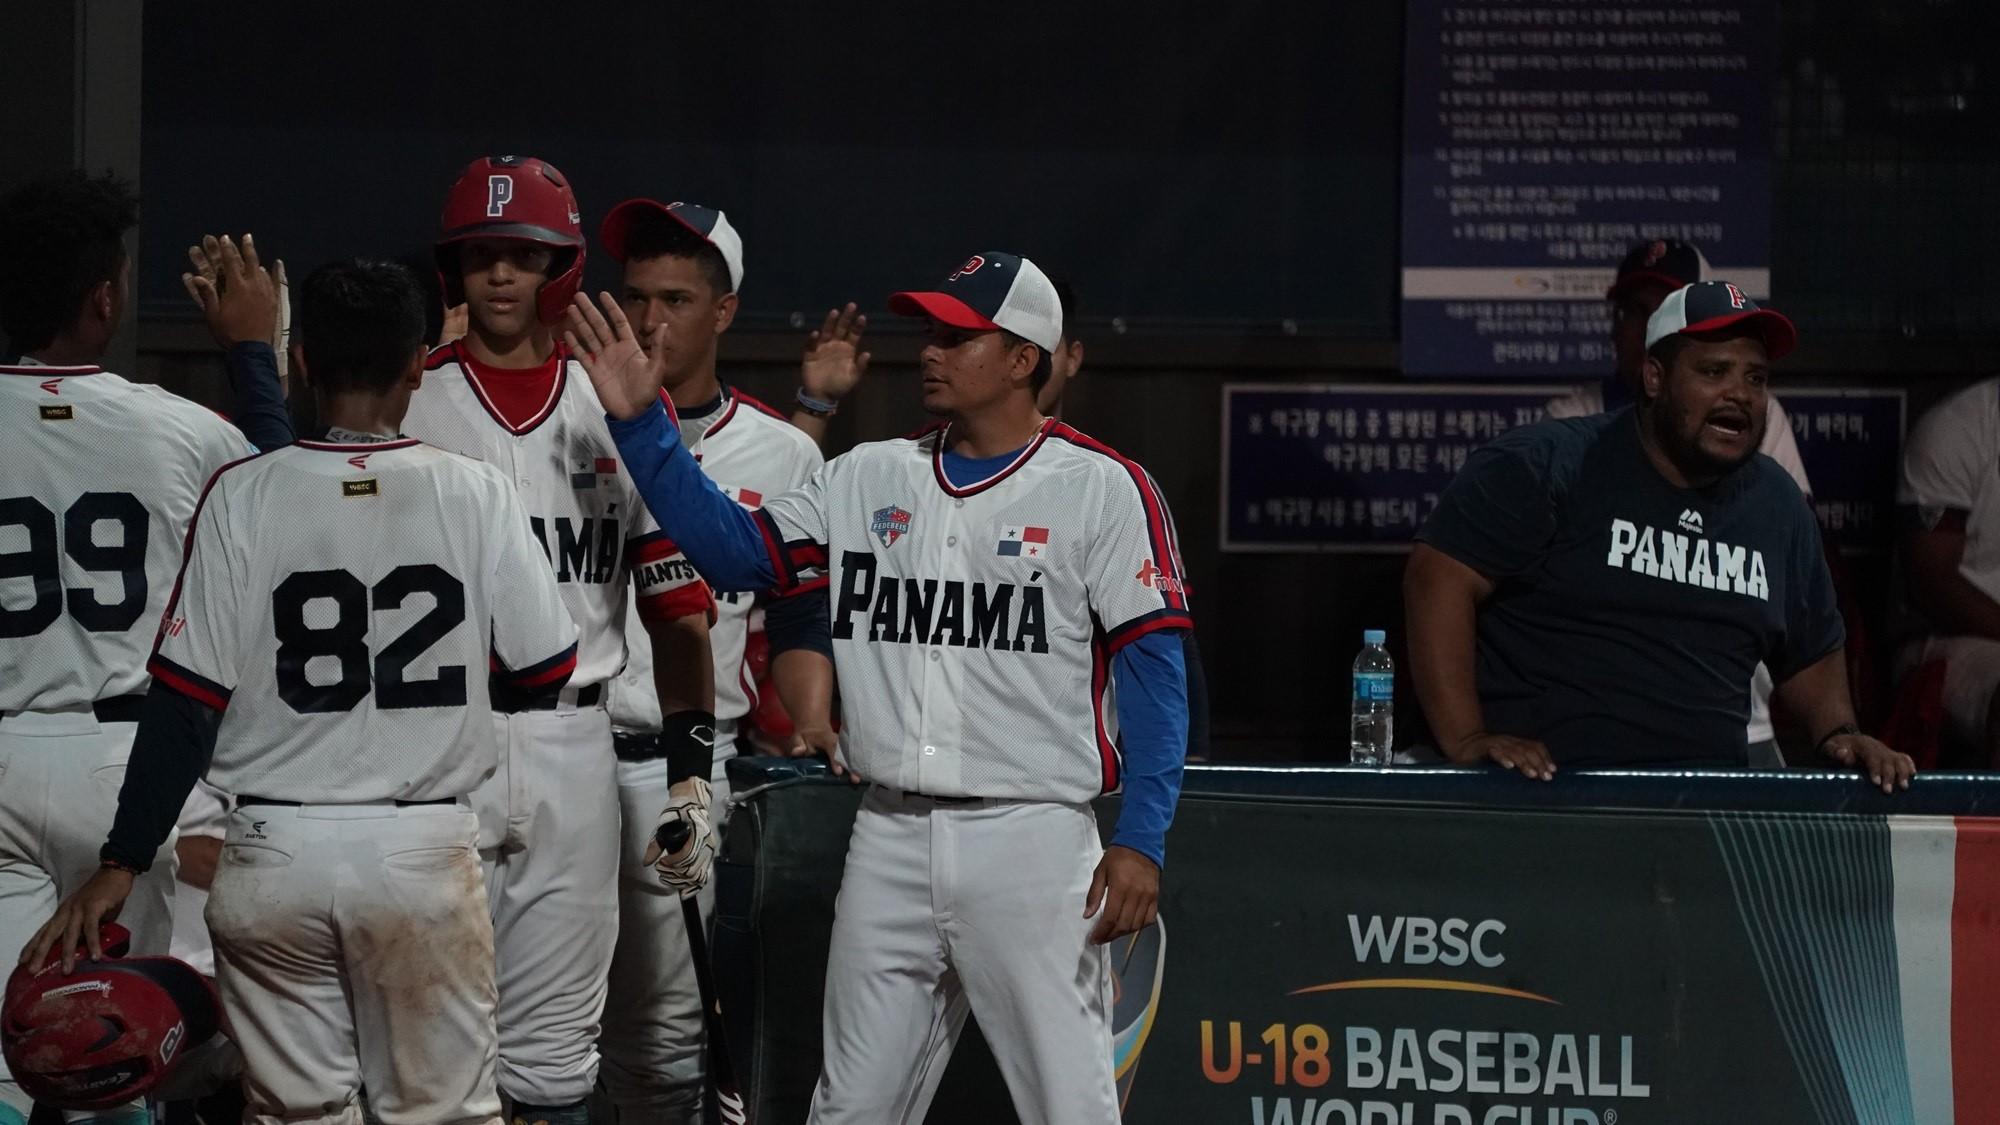 Panama celebrates a run